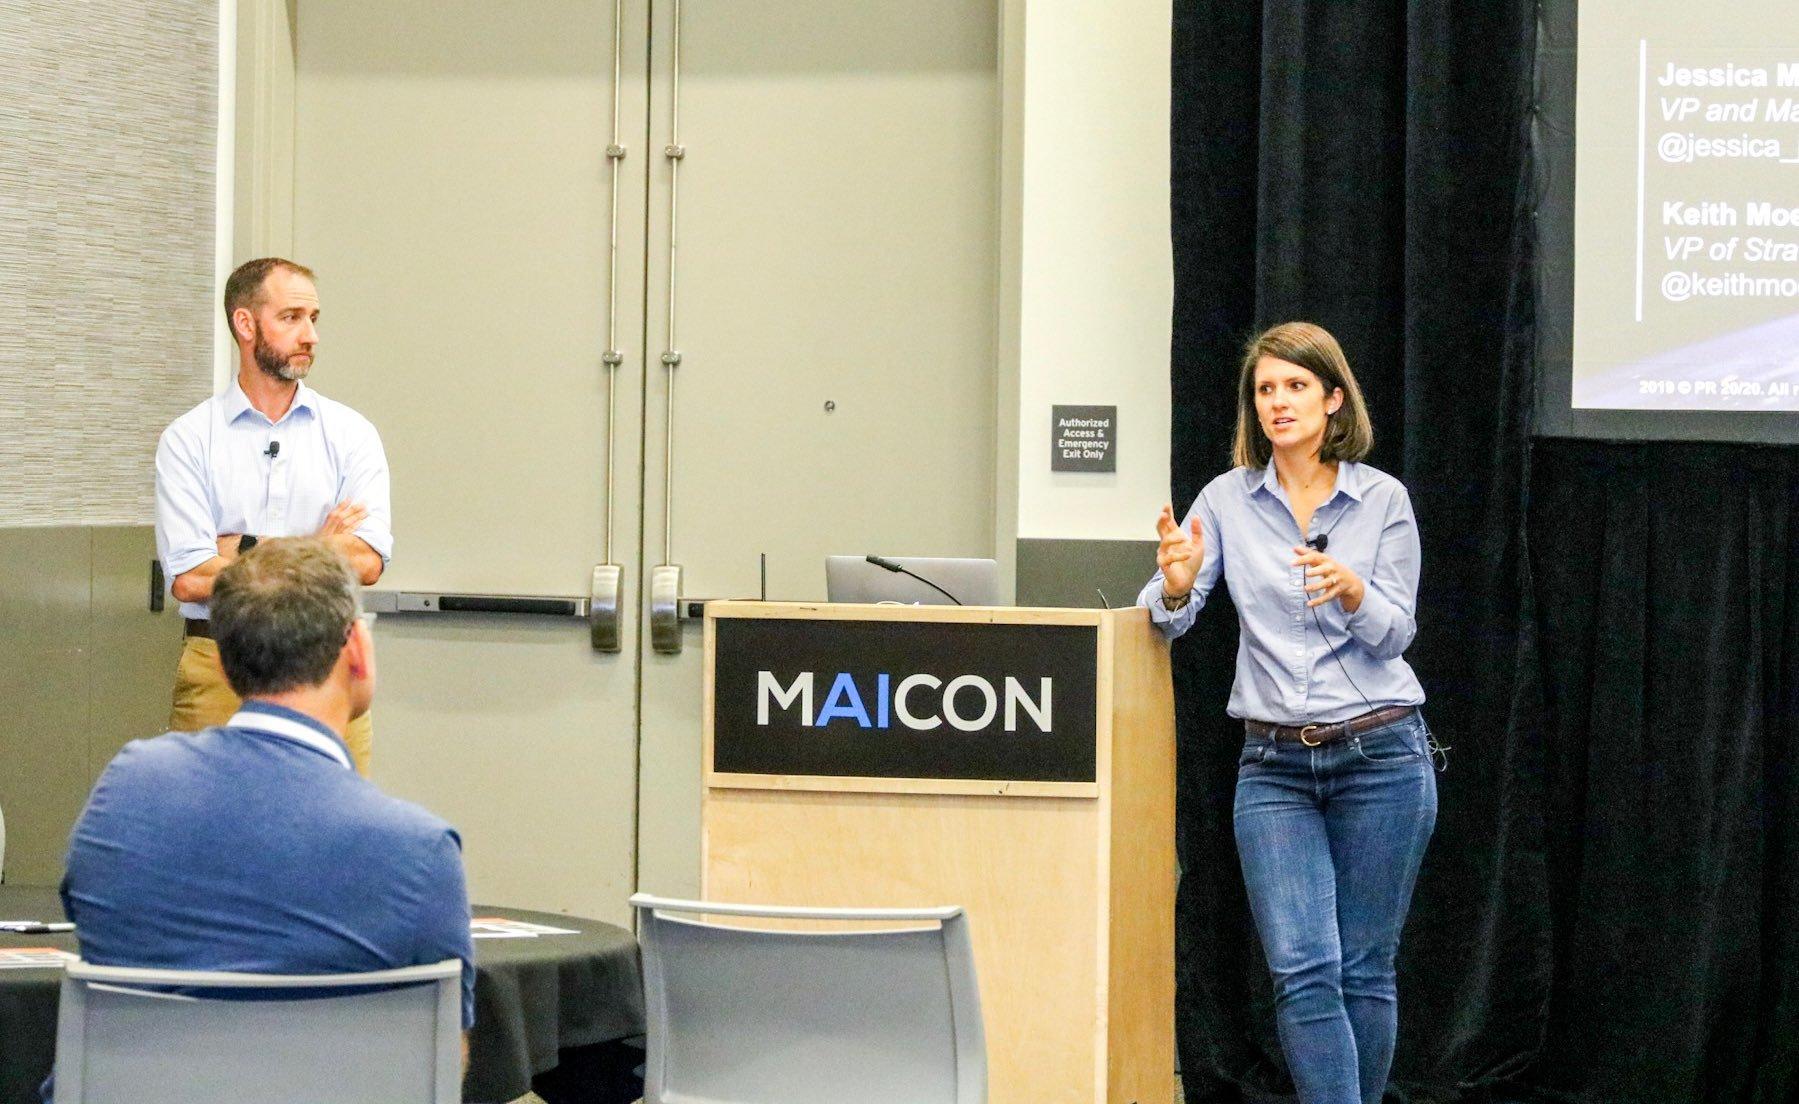 MAICON-speaking